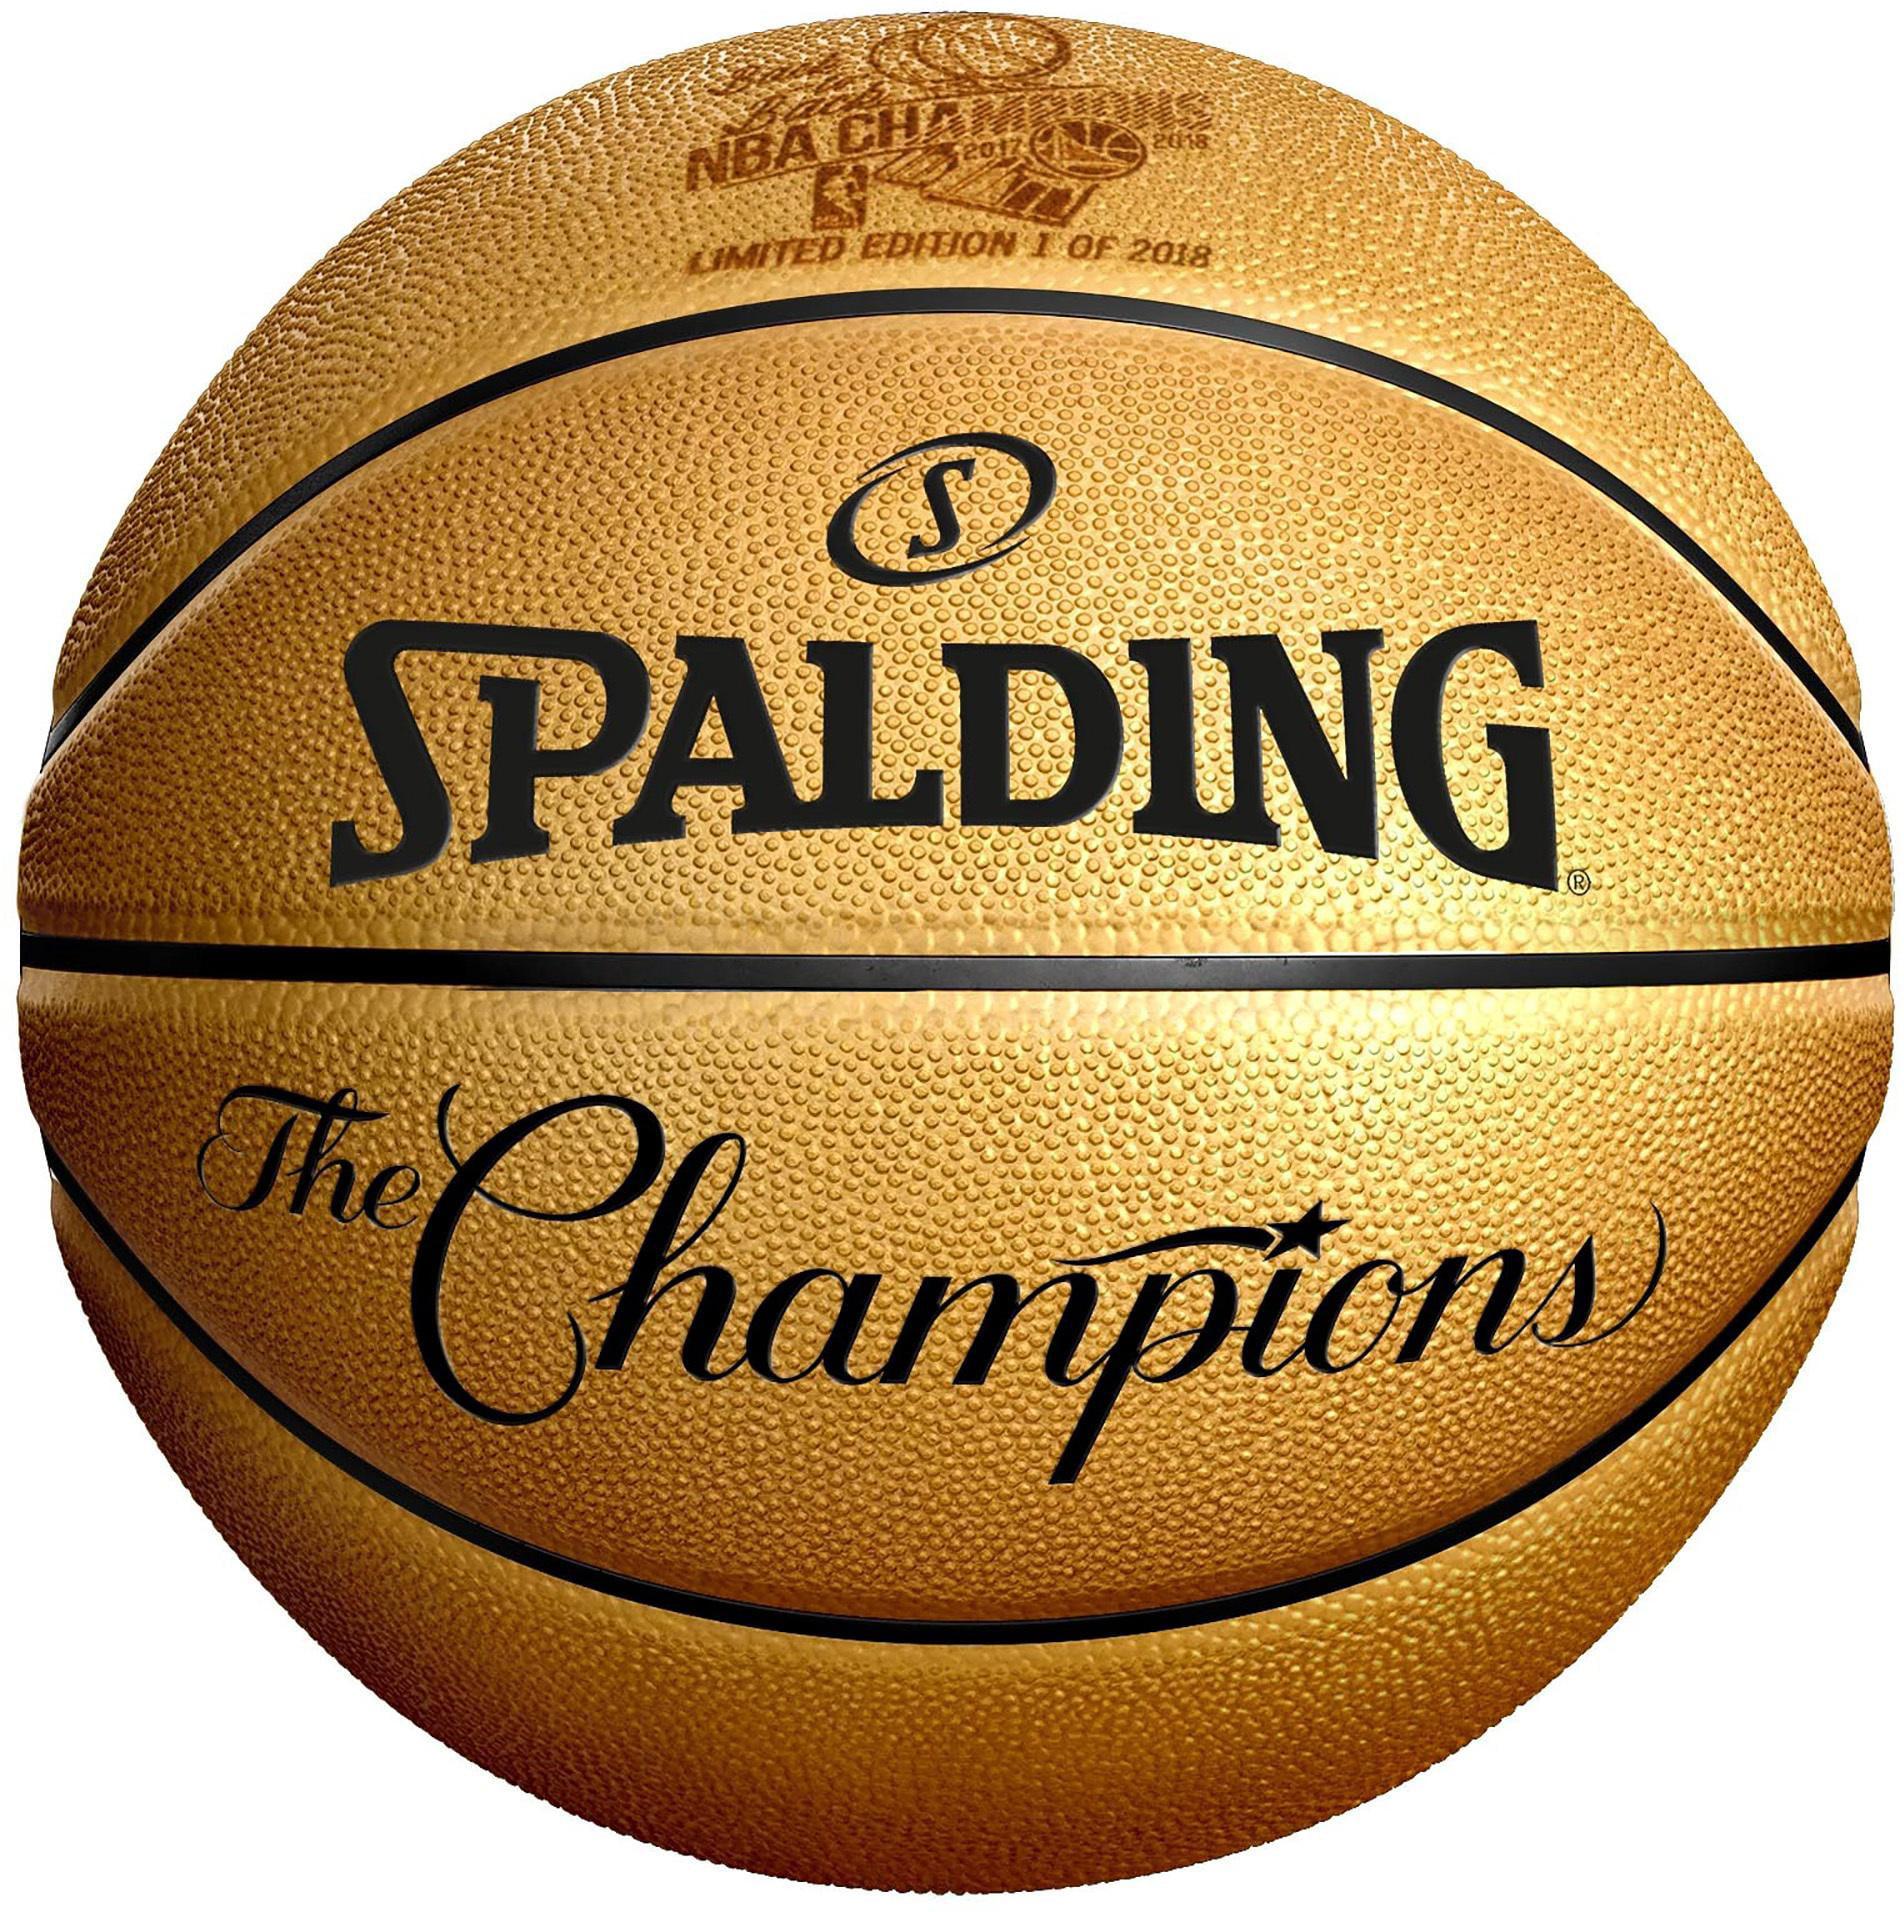 Golden State Warriors 2018 NBA Finals Champions Spalding Gold Laser Engraved Basketball